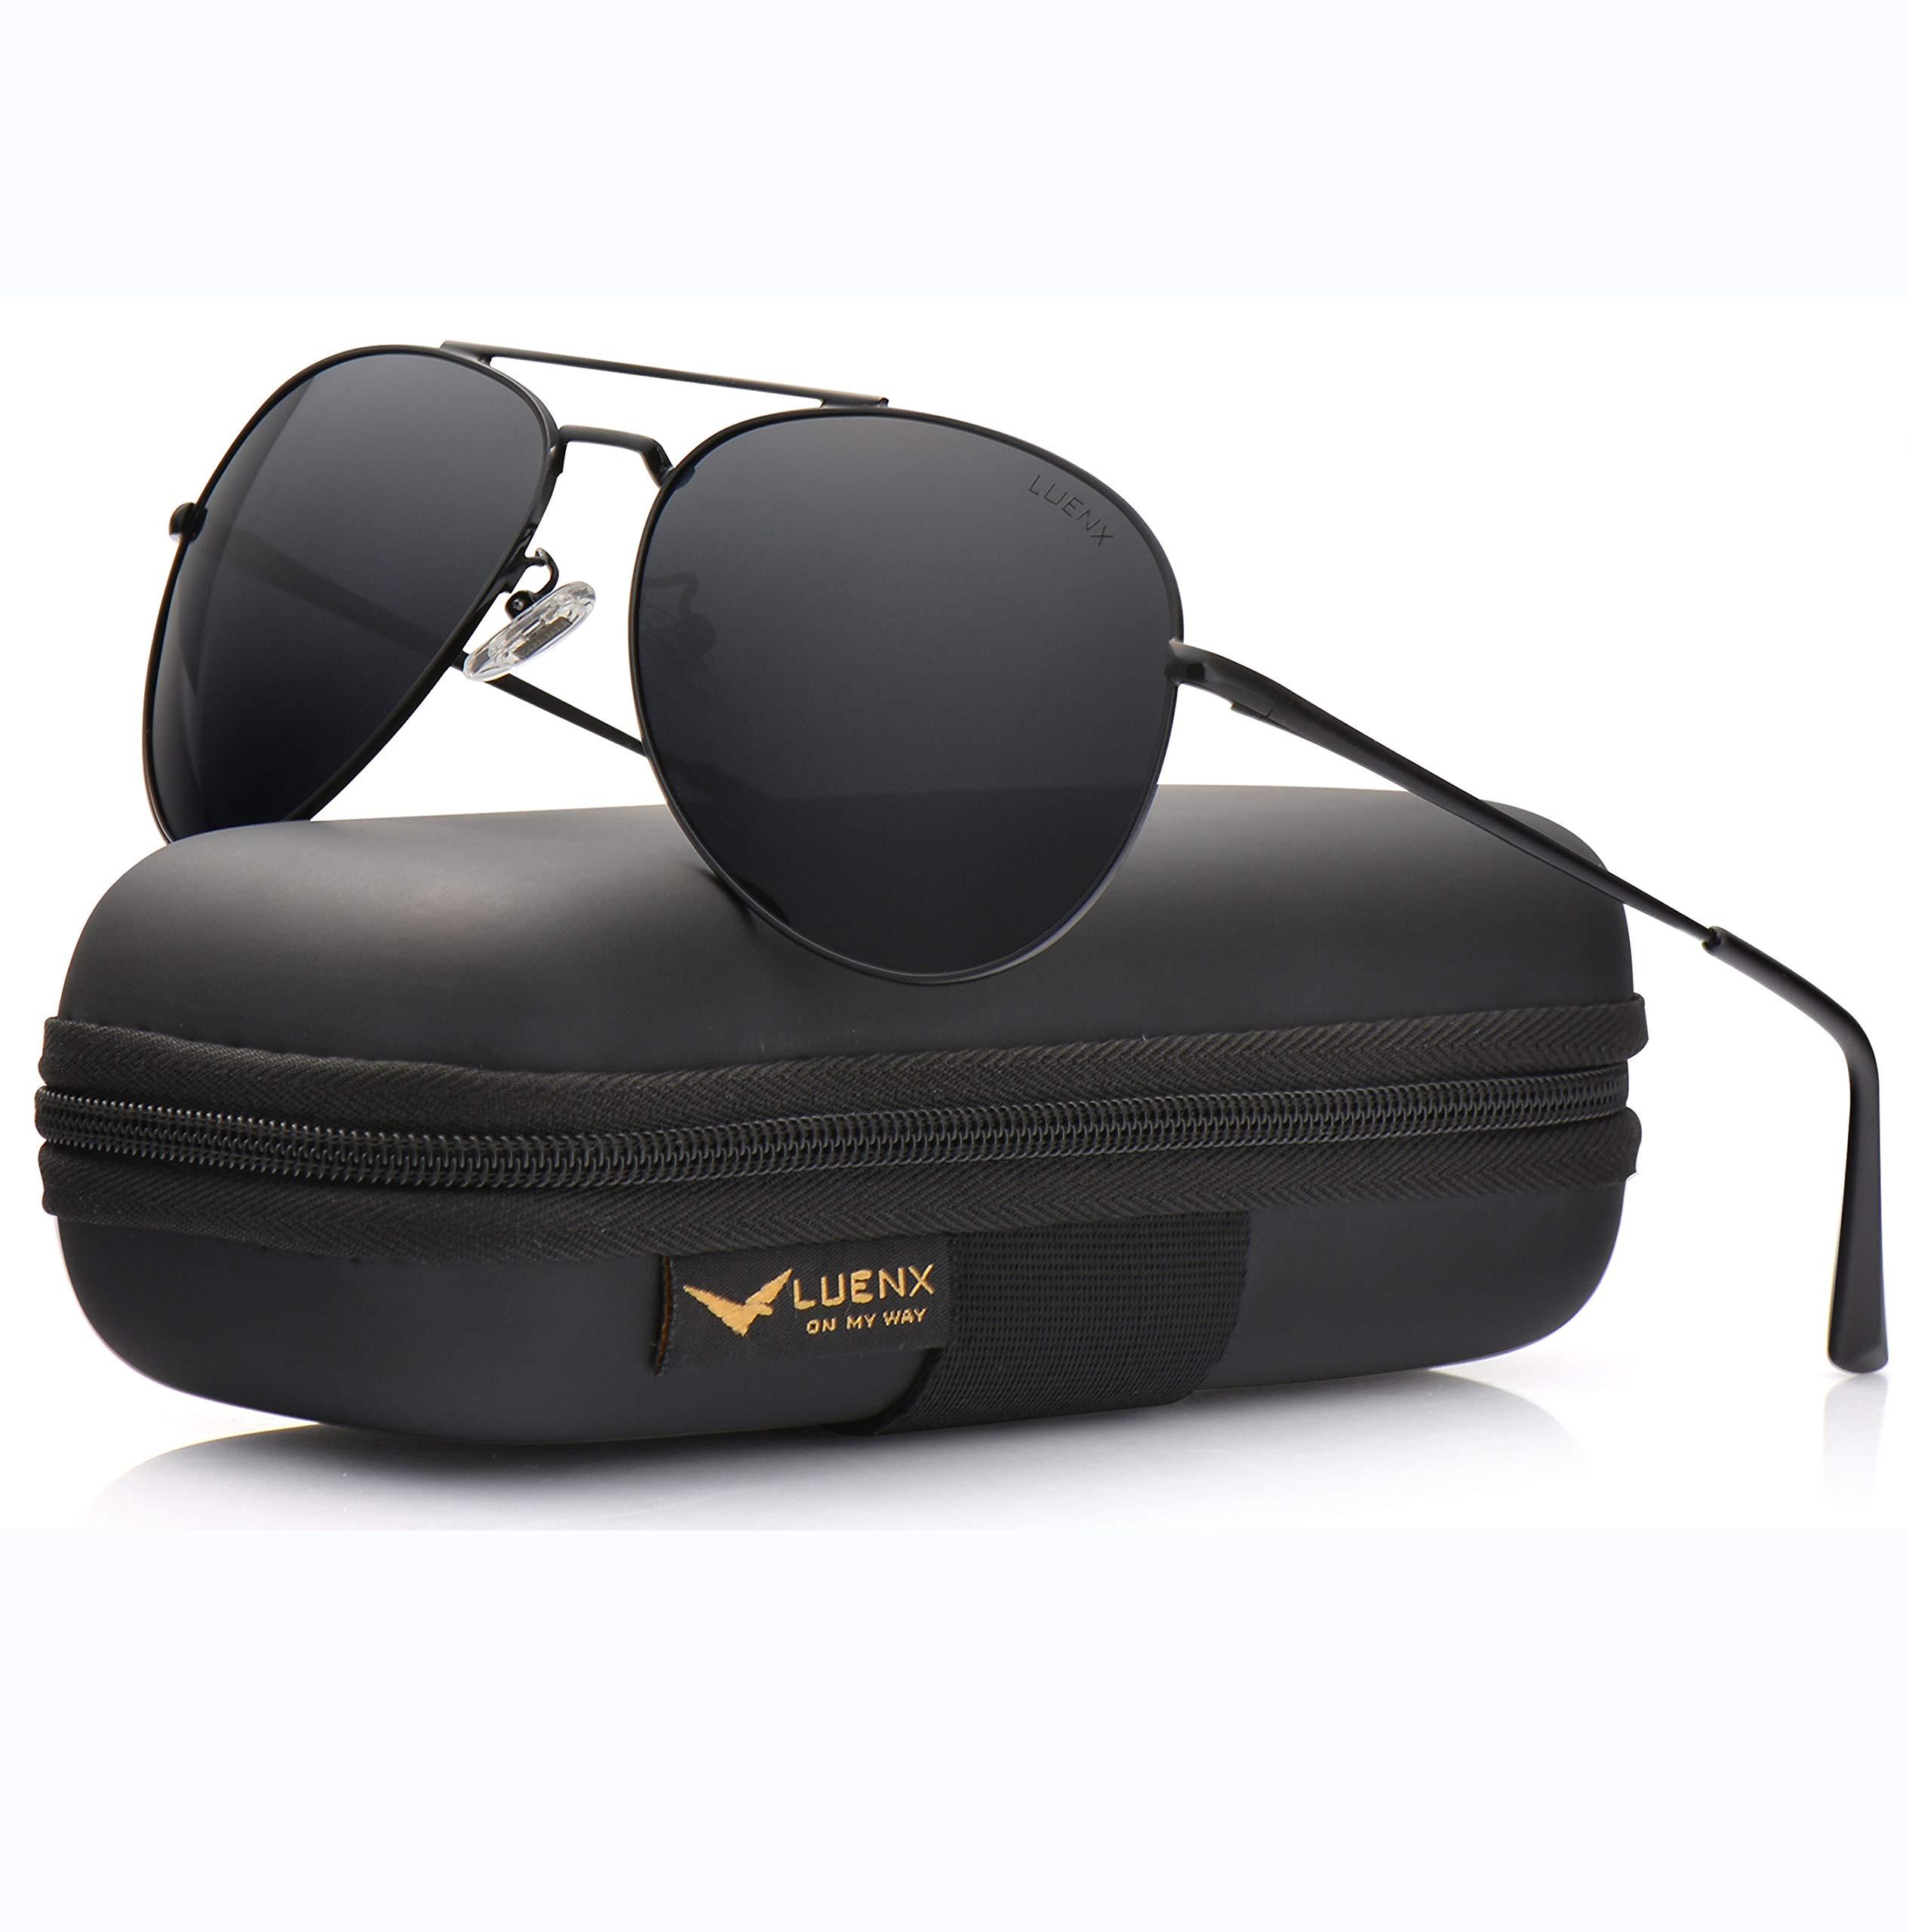 40ead8a7ea Galleon - LUENX Aviator Sunglasses Men Women Polarized With Case - UV 400  Non-Mirror Black Lens Metal Black Frame 60mm